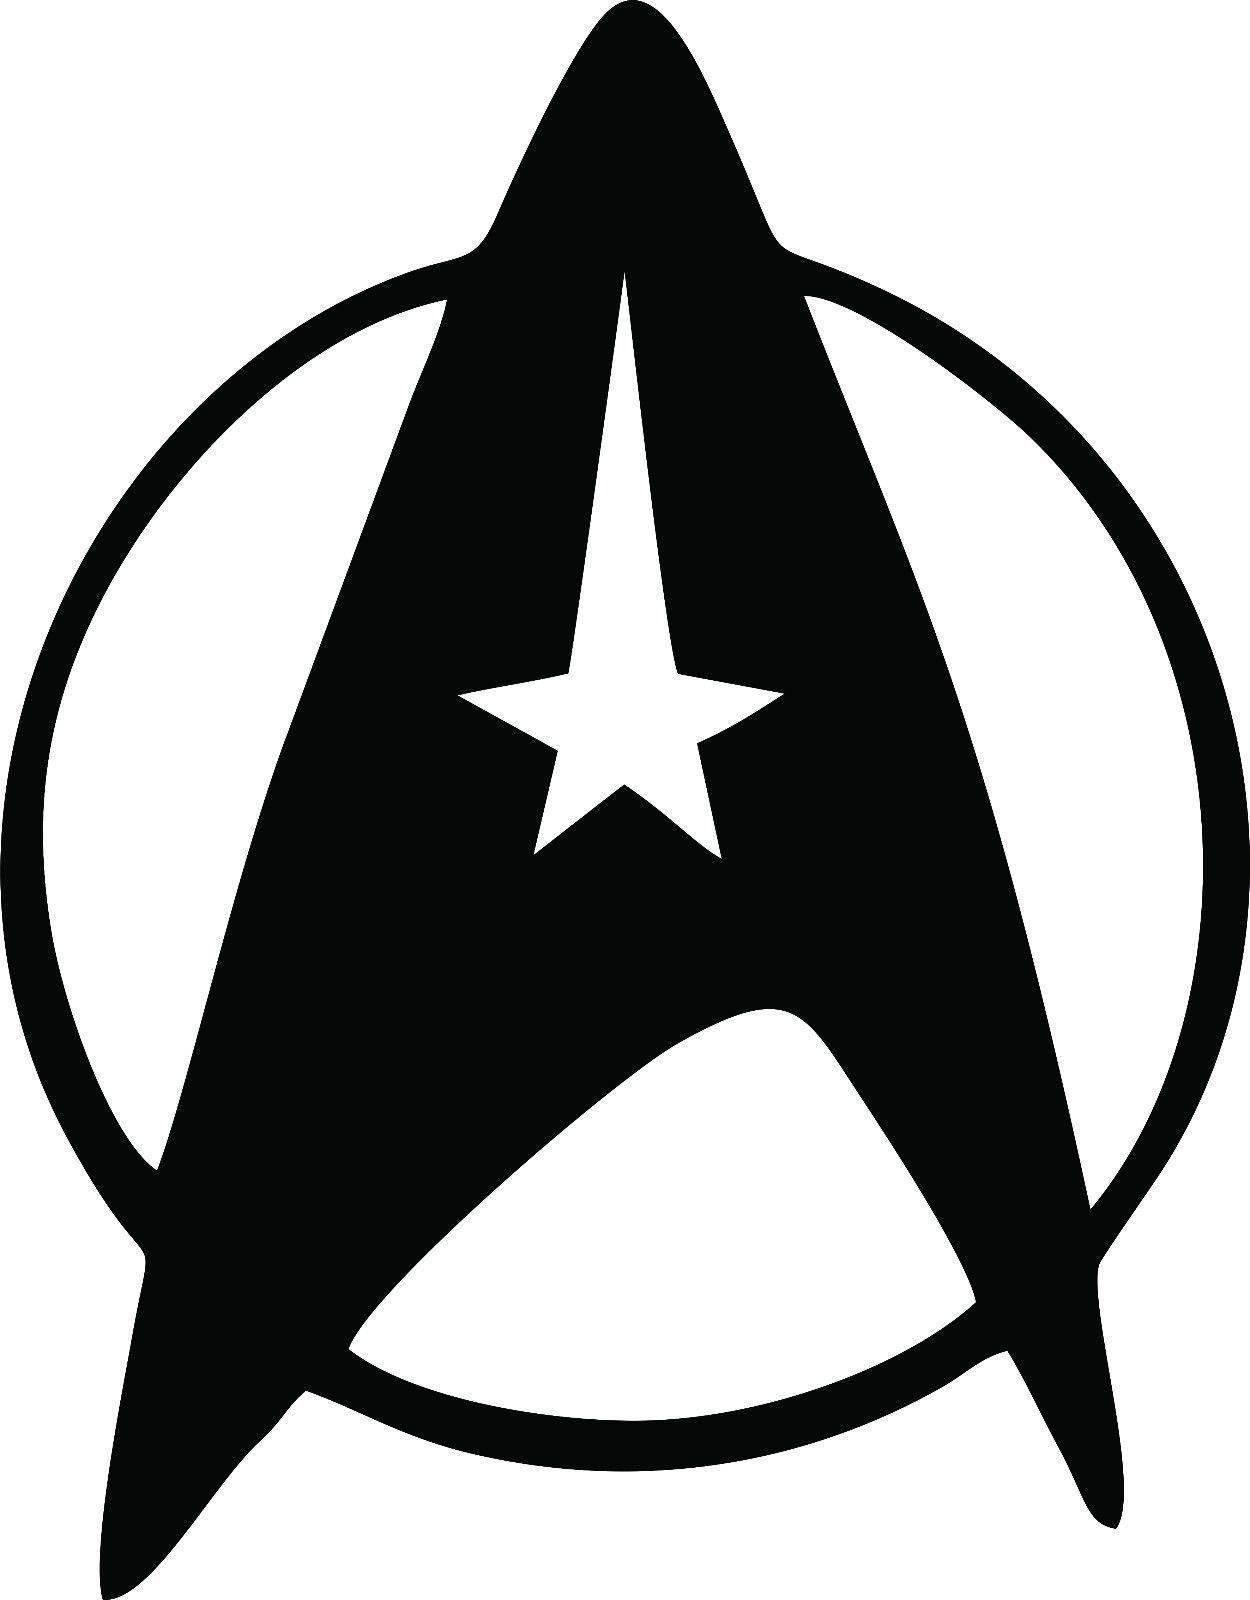 Star Trek Federation Symbol Logo Vinyl Decal Laptop Car Geek Nerd Stickers Muraux Plaque De Rue Affiche Star Trek [ 1600 x 1250 Pixel ]